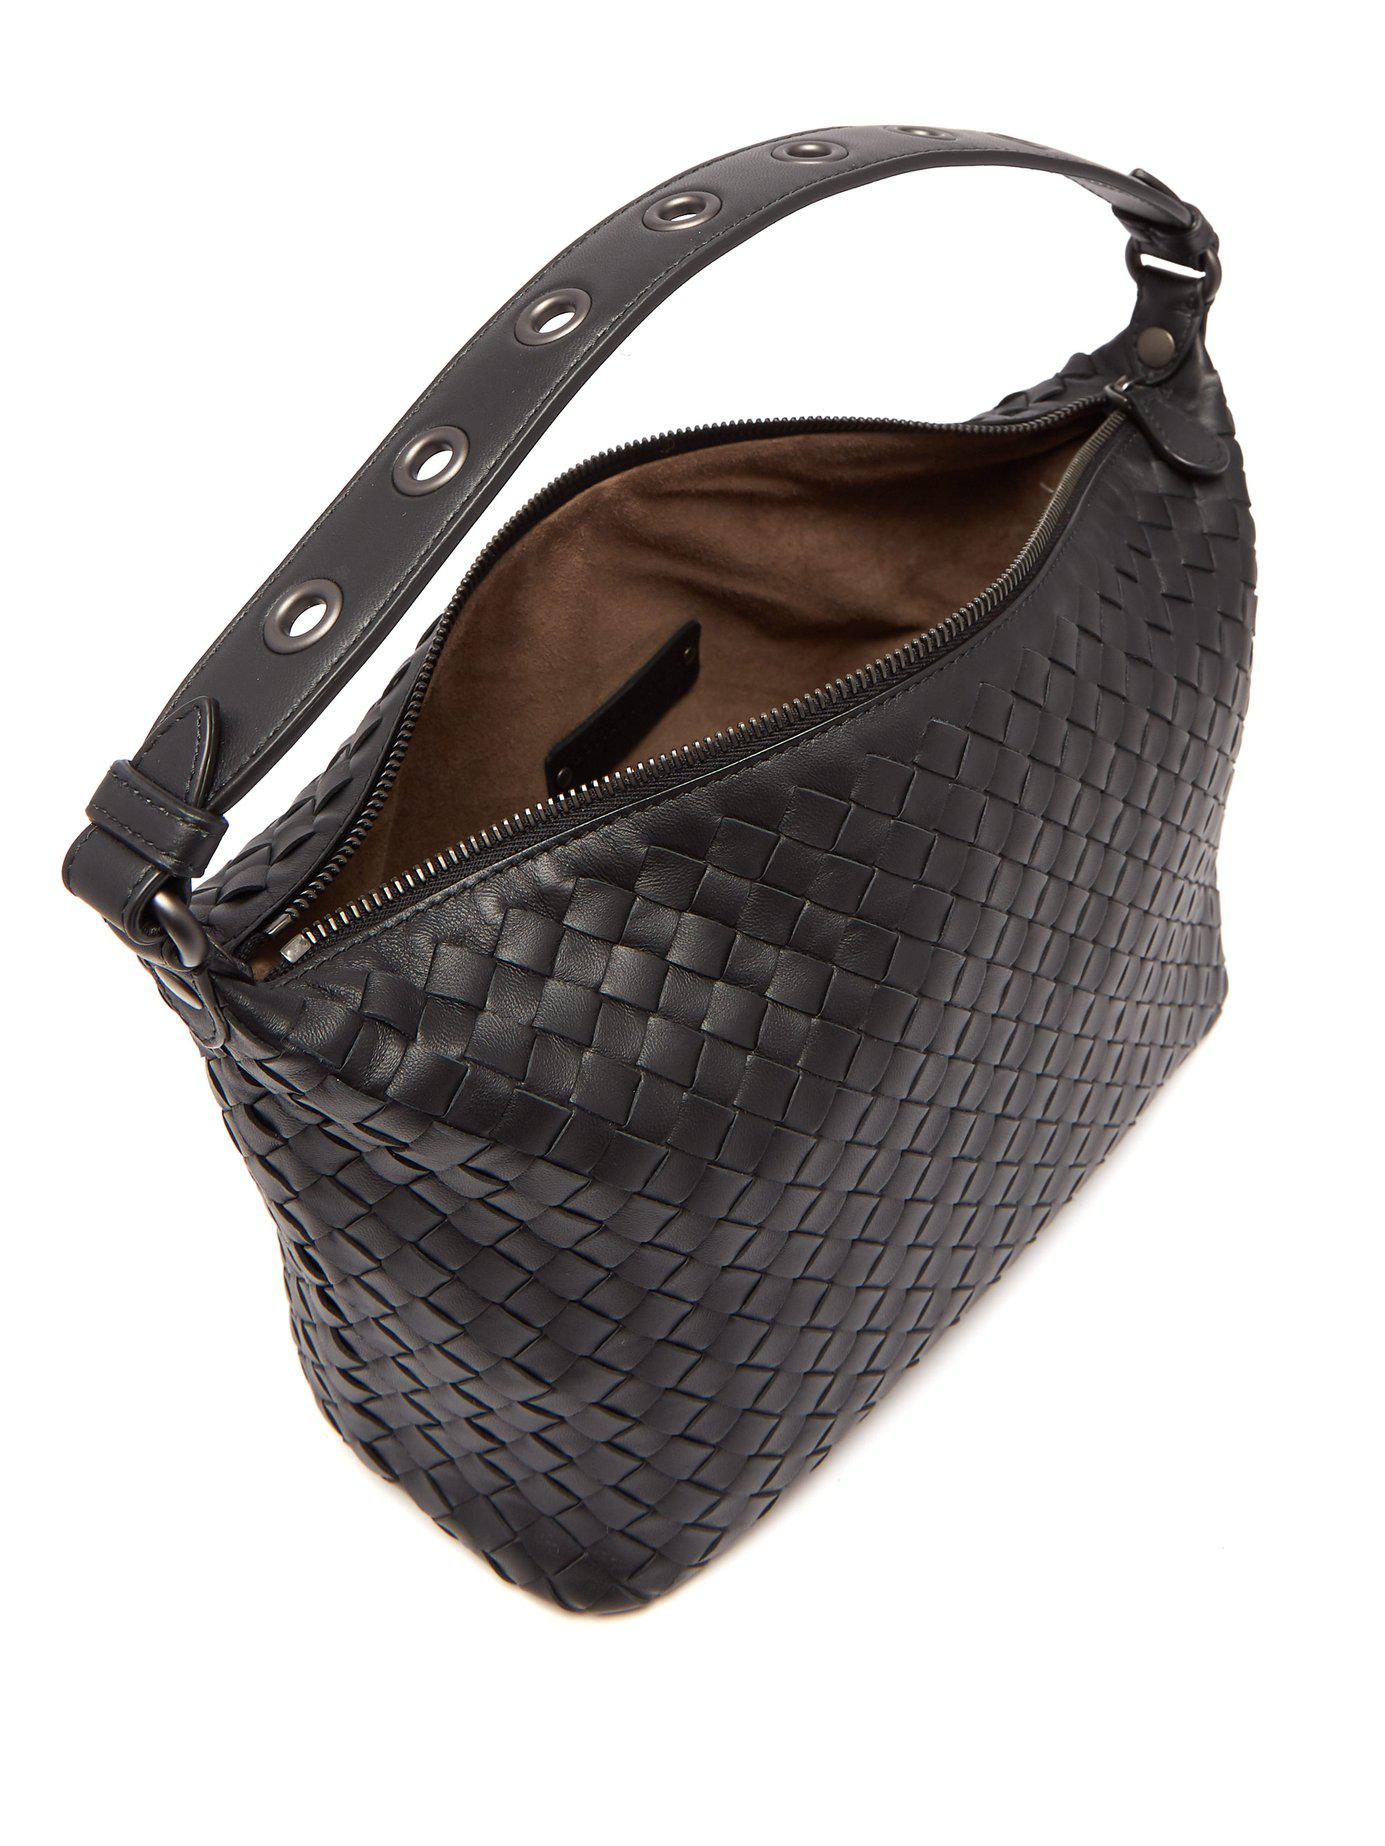 Bottega Veneta - Black Ciambrino Intrecciato Leather Shoulder Bag - Lyst.  View fullscreen 15f659049ffe8